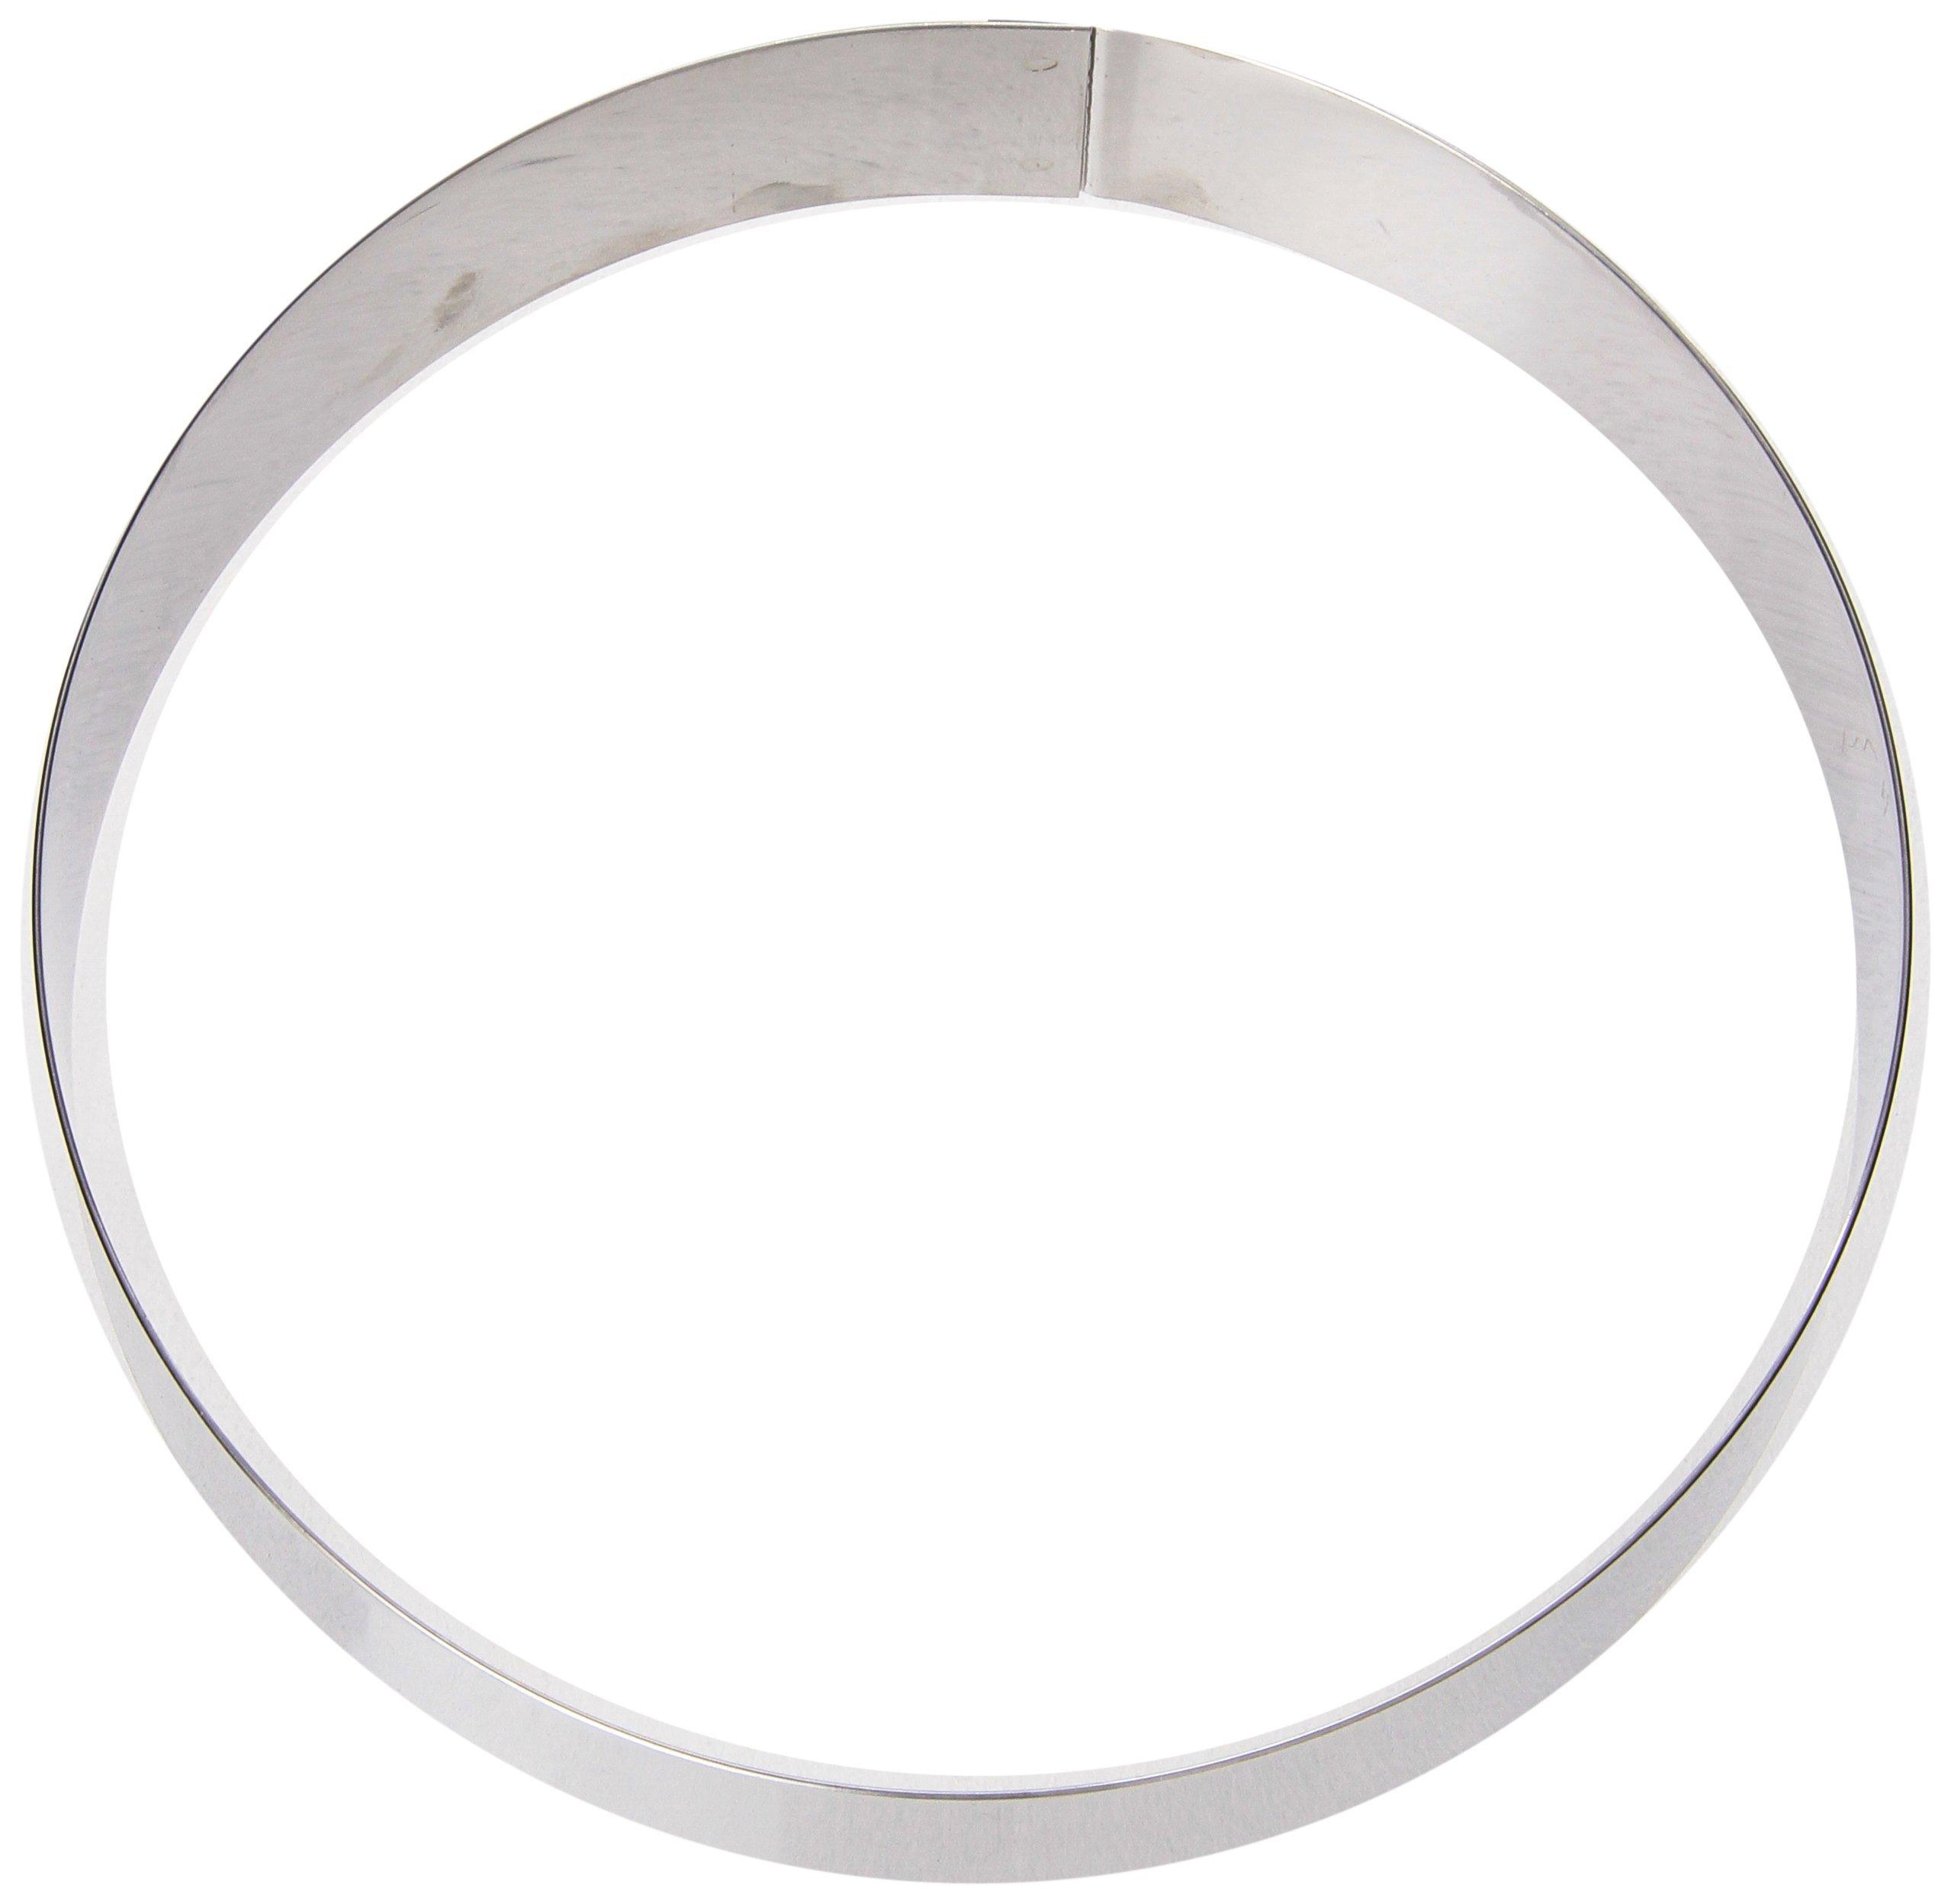 Matfer Bourgeat 371408 Mousse Ring, Silver